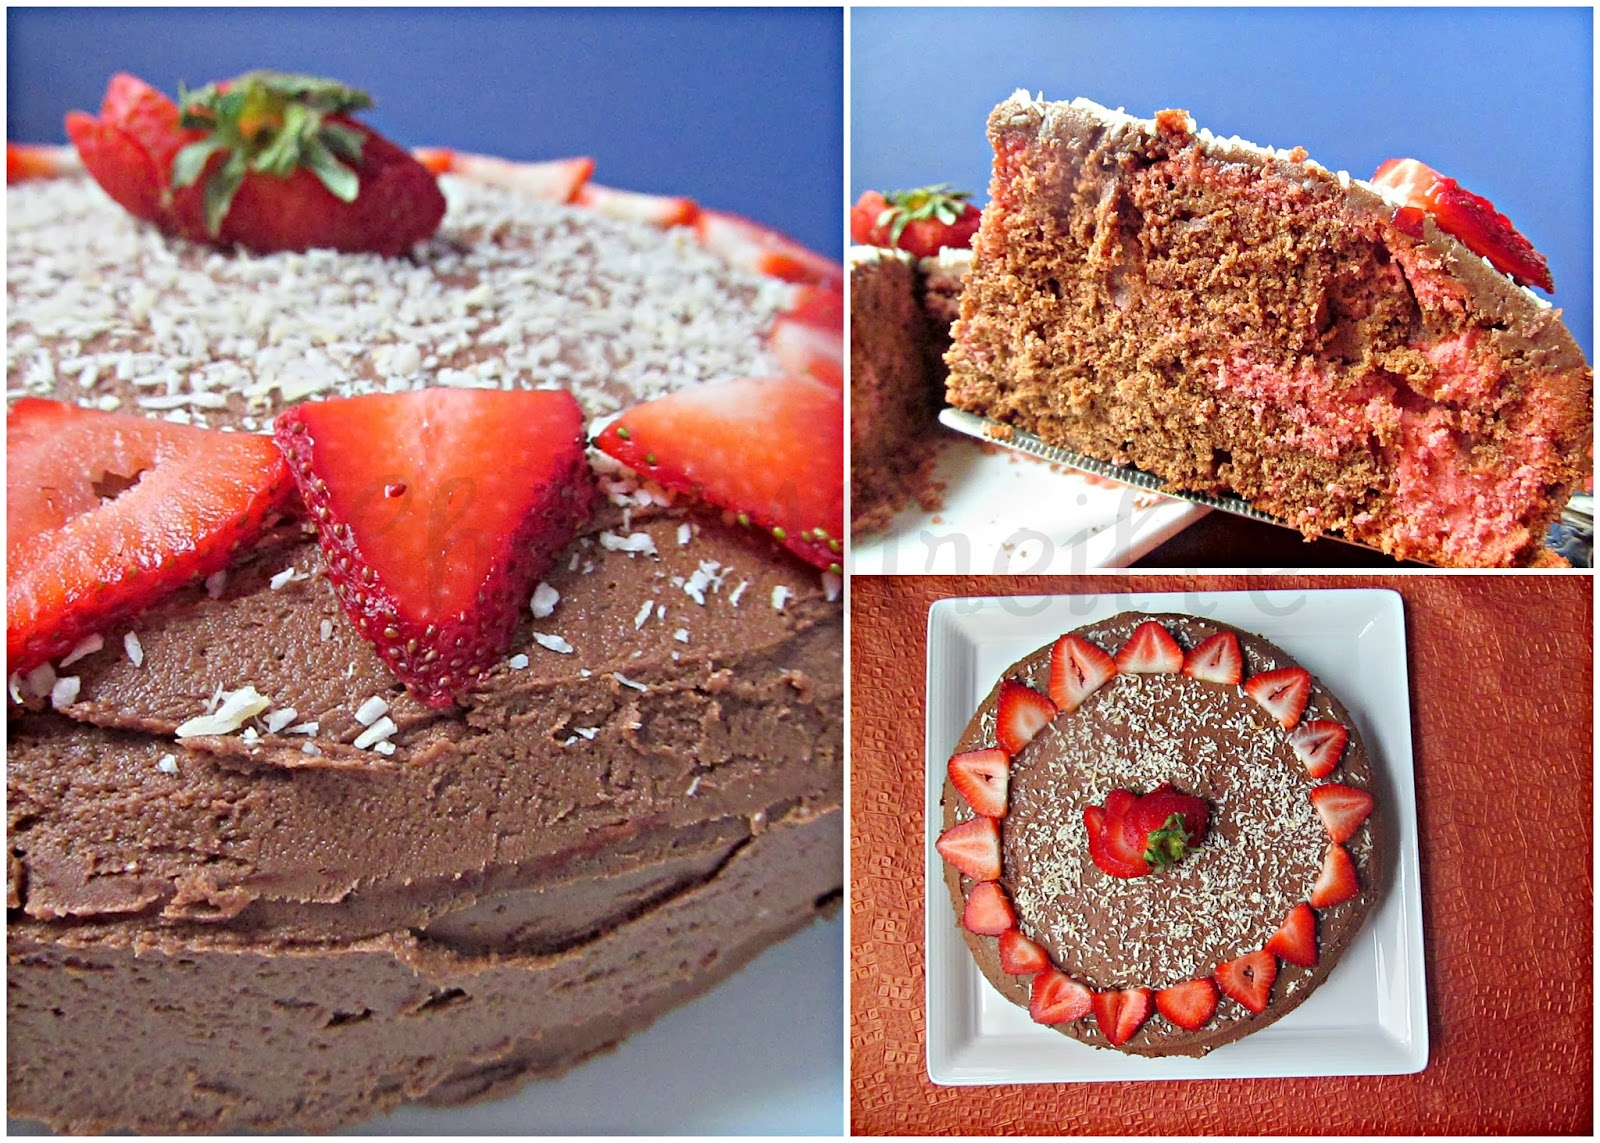 Strawberry Chocolate Marble Cake - The Schizo Chef